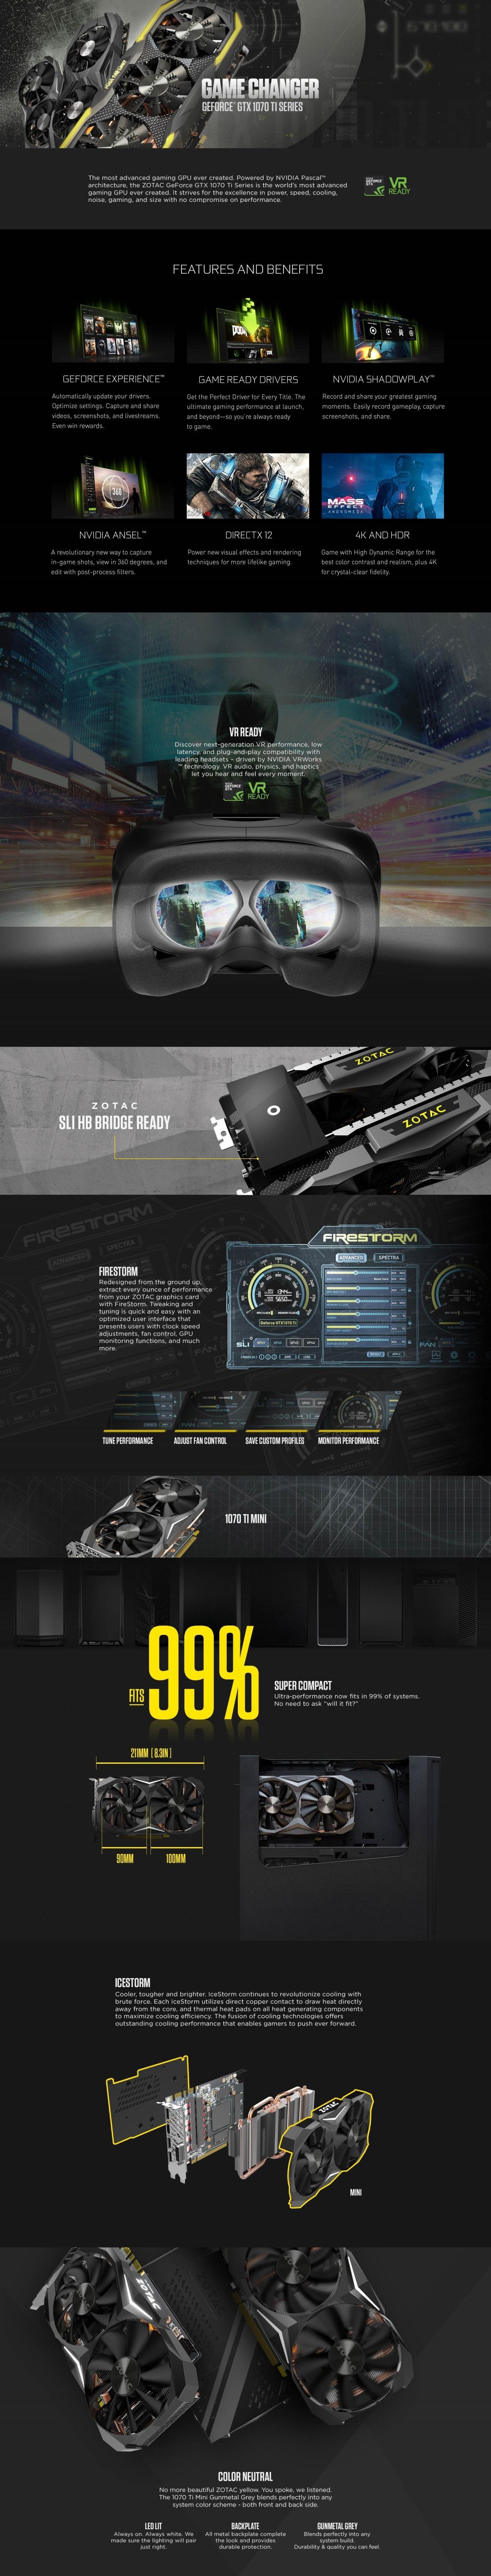 ZOTAC GeForce GTX 1070 Ti Mini ZT-P10710G-10P 8GB 256 bit GDDR5 Dual Fan  IceStorm Graphic Card - JOINED CLEARANCE SALE